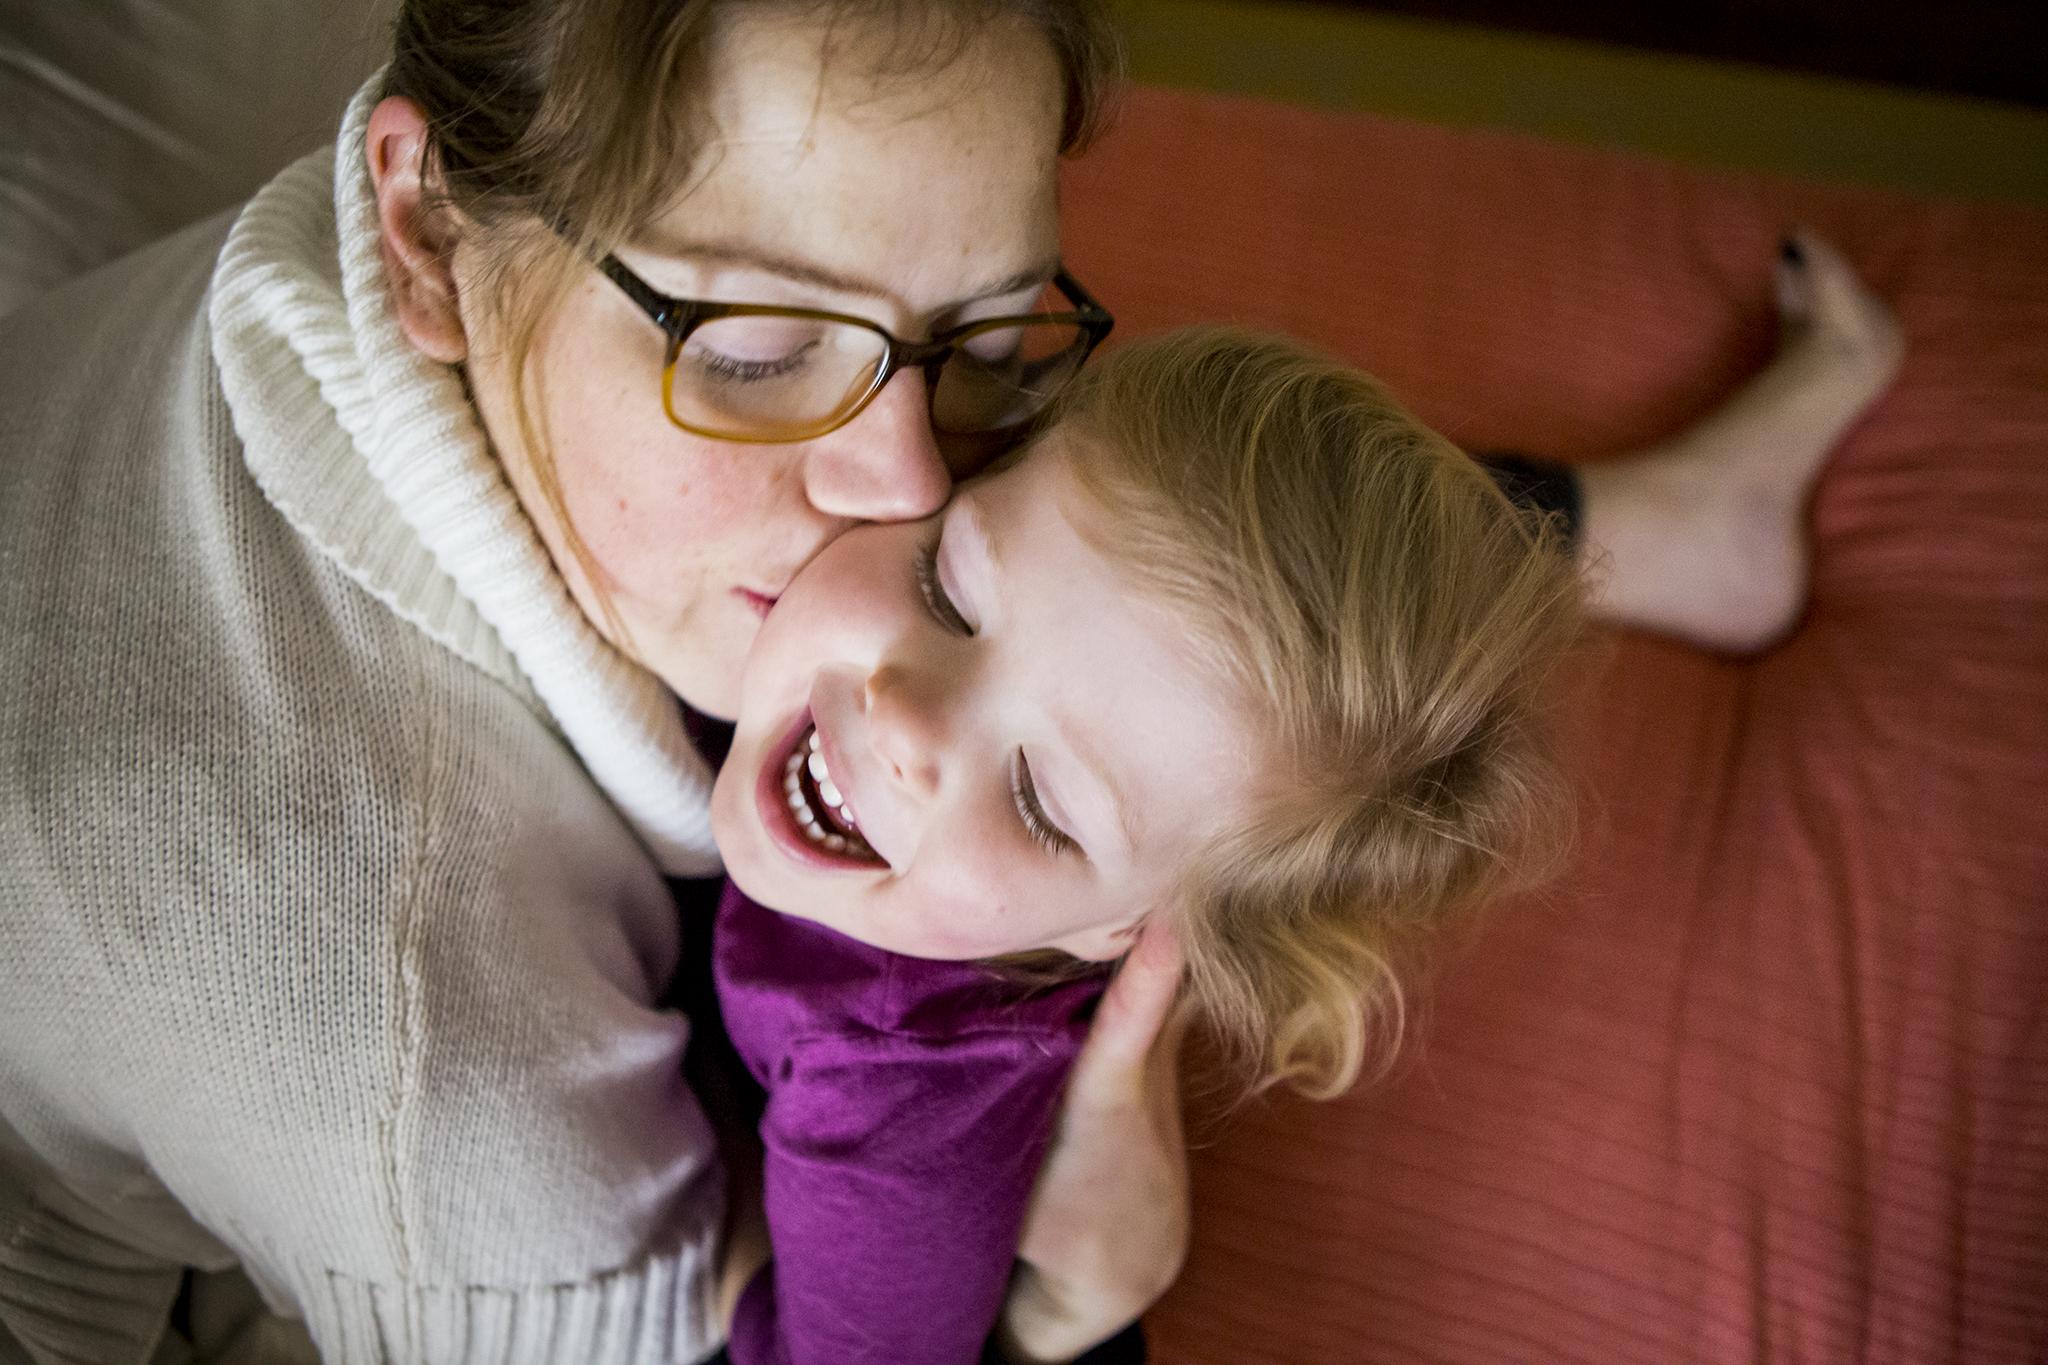 Joyful Connecticut family photos of mom hugging smiling daughter.